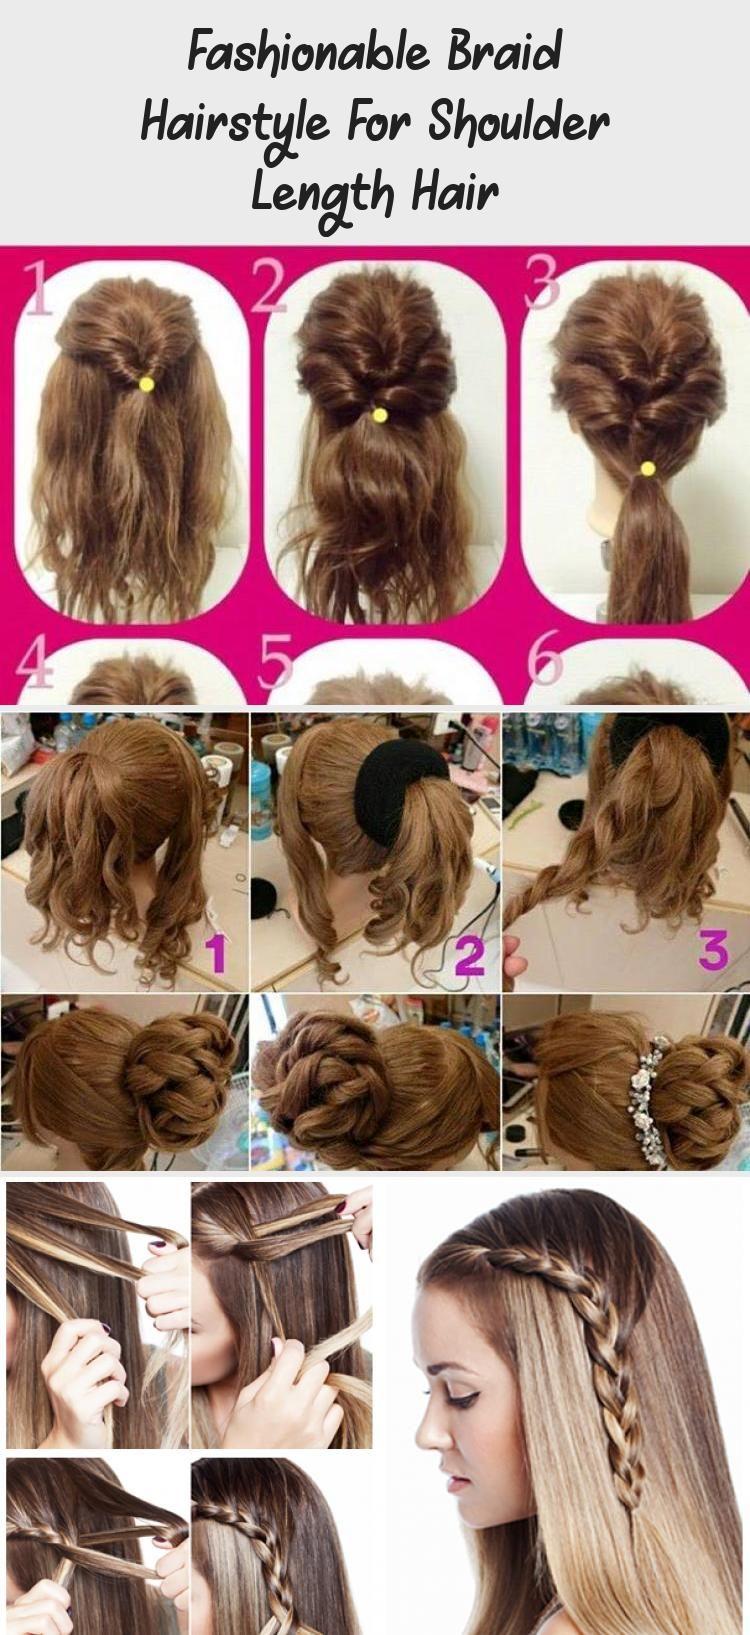 Fashionable Braid Hairstyle For Shoulder Length Hair Hairtutorialbun Hairtutorialpeinados Hairtutorialb In 2020 Hair Lengths Shoulder Length Hair Braided Hairstyles